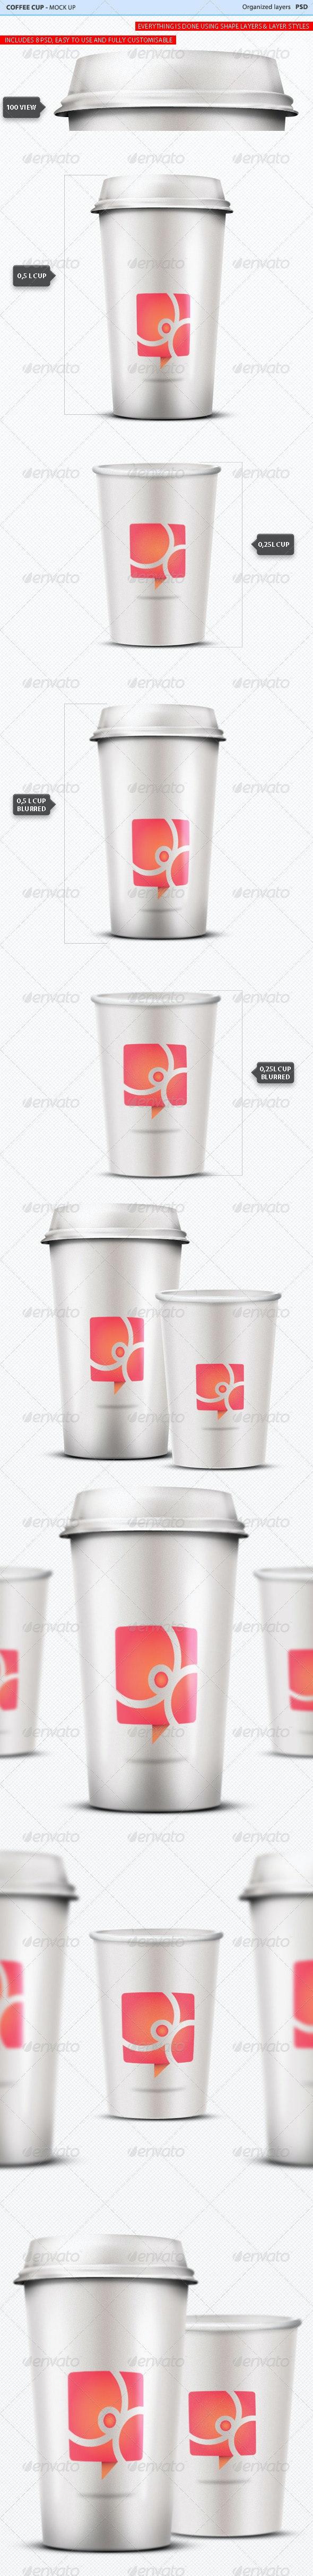 Coffee Cup Mock Ups #1 - Food and Drink Packaging